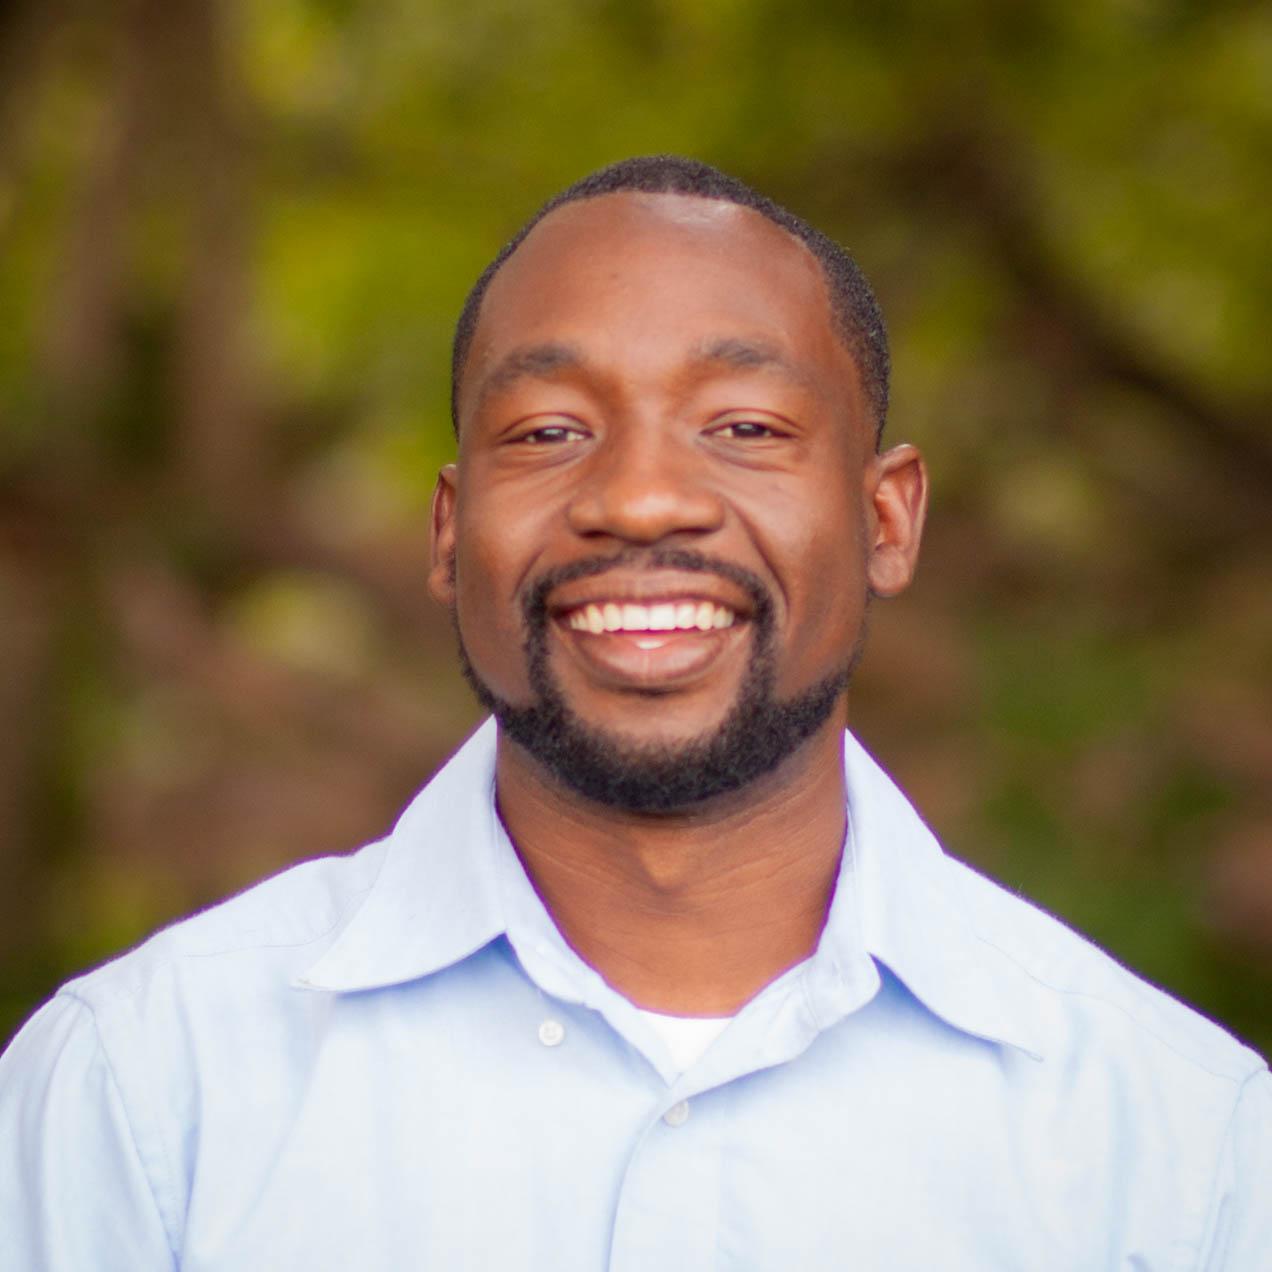 Carl Winn  Director of Operations  carl@agapedevelopment.org